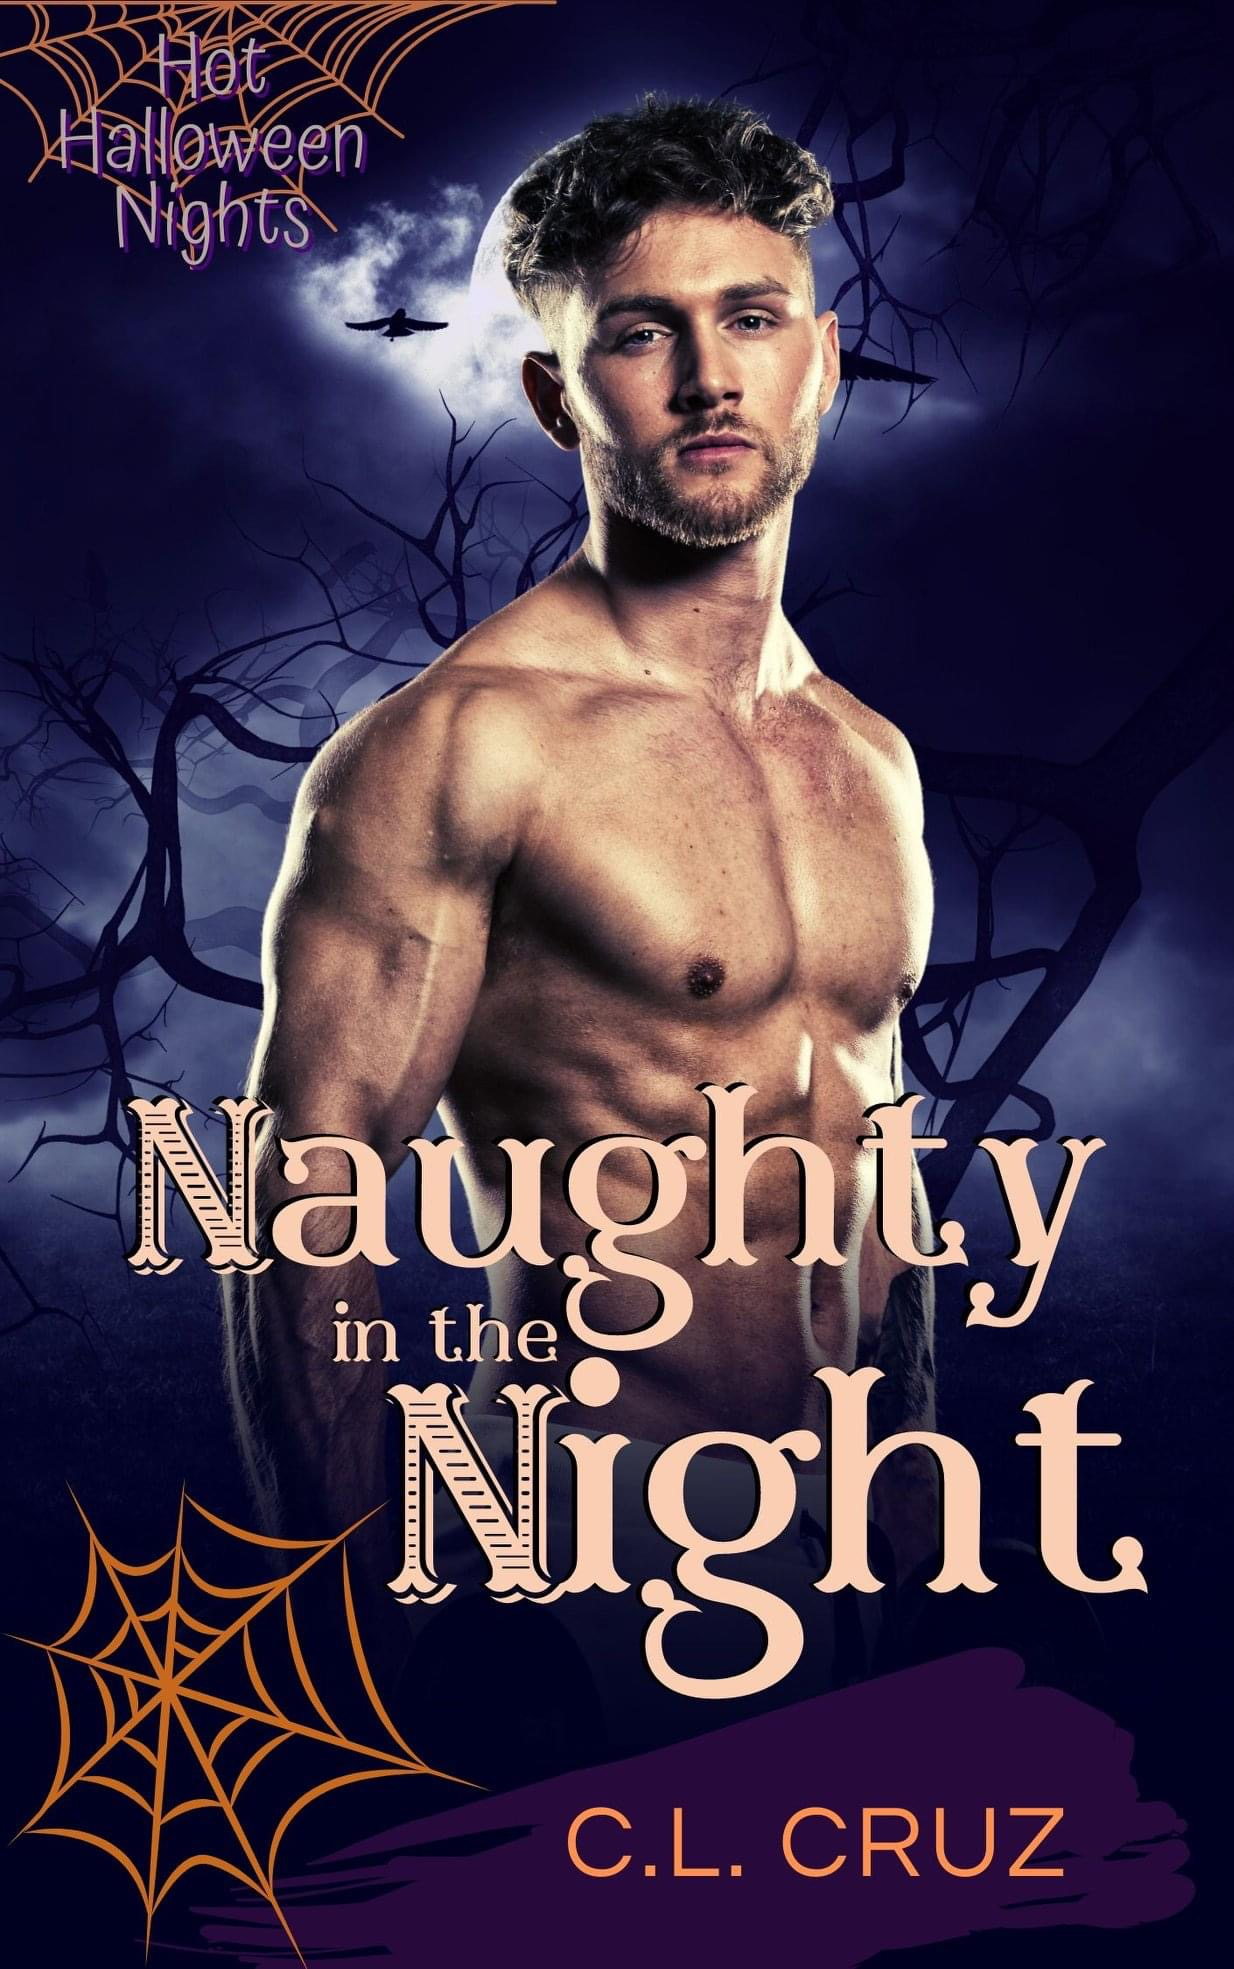 [PDF] [EPUB] Naughty in the Night (Hot Halloween Nights, #2) Download by C.L. Cruz